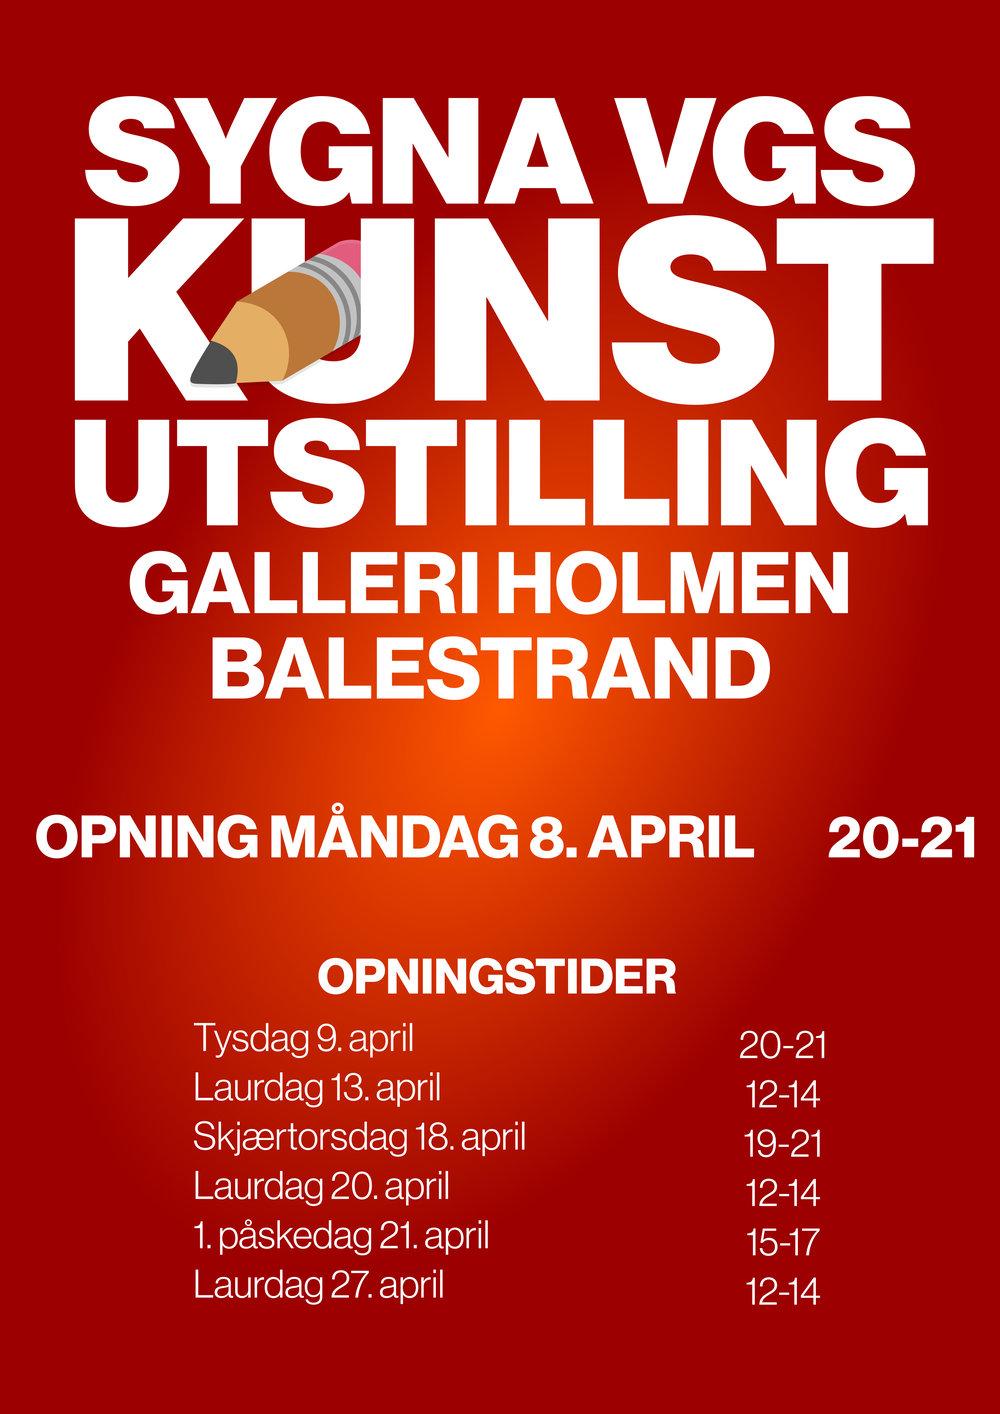 Sygna VGS Kunstutstilling 2019.jpg